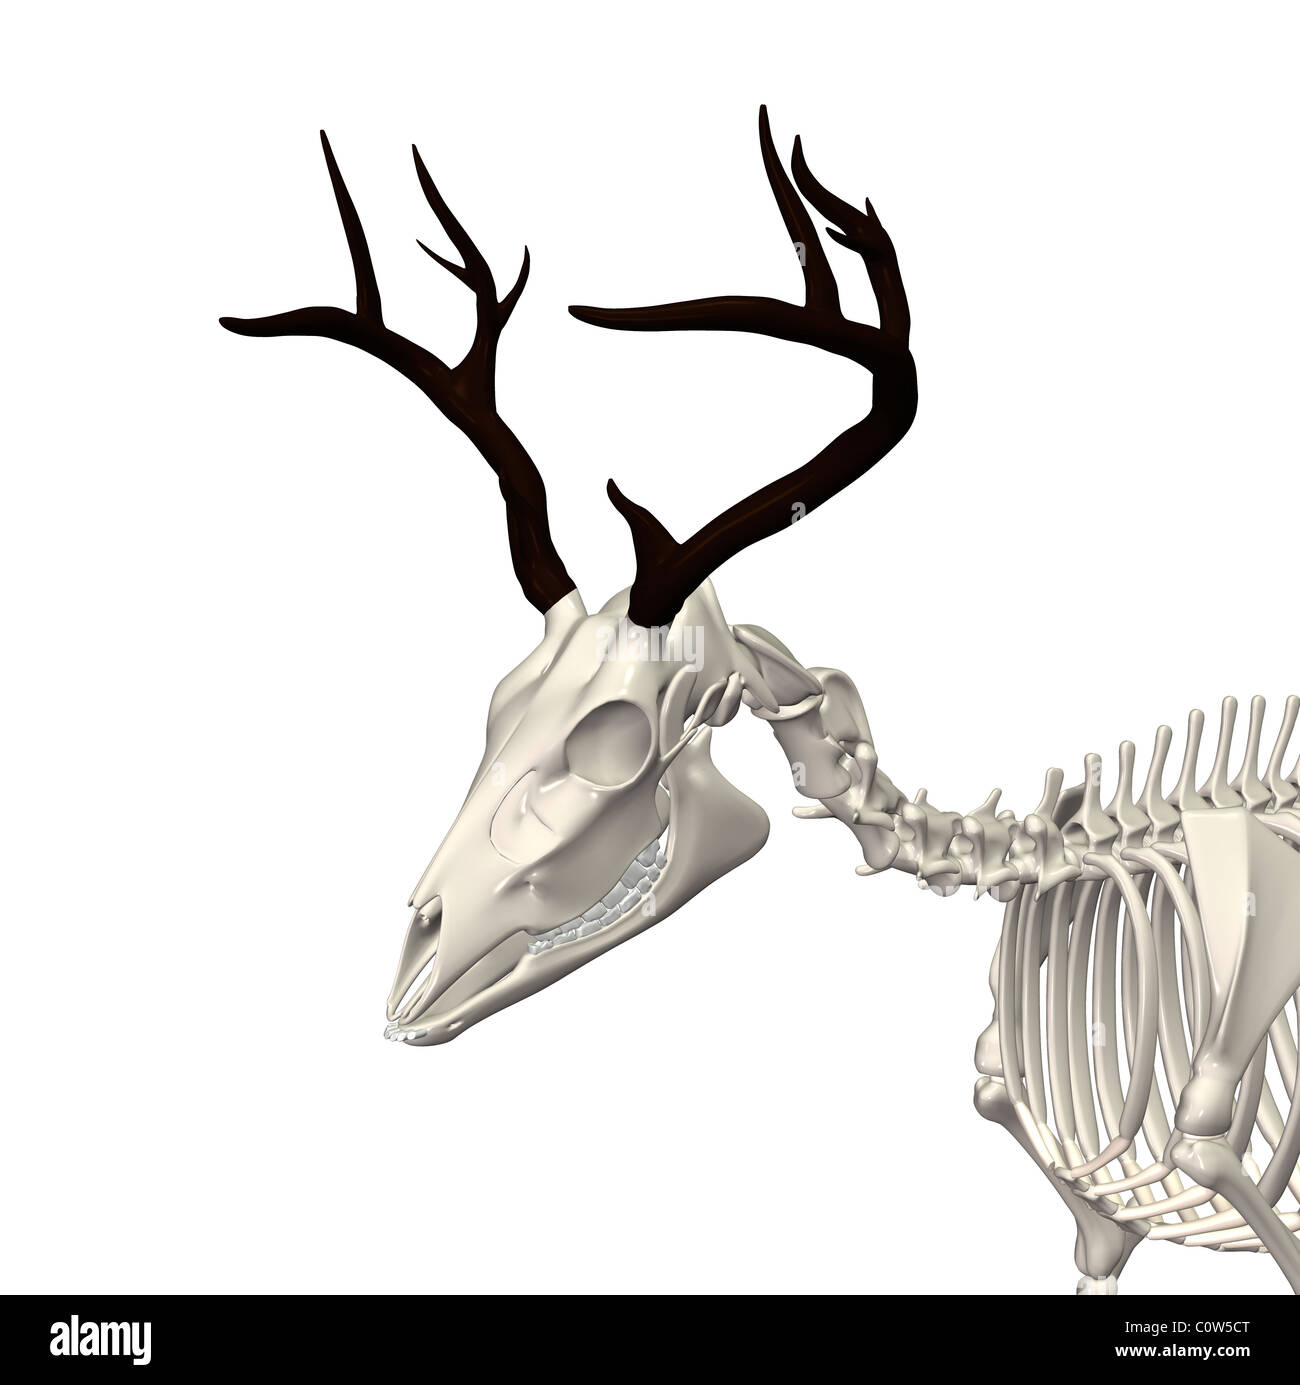 deer anatomy skeleton Stock Photo: 34973816 - Alamy